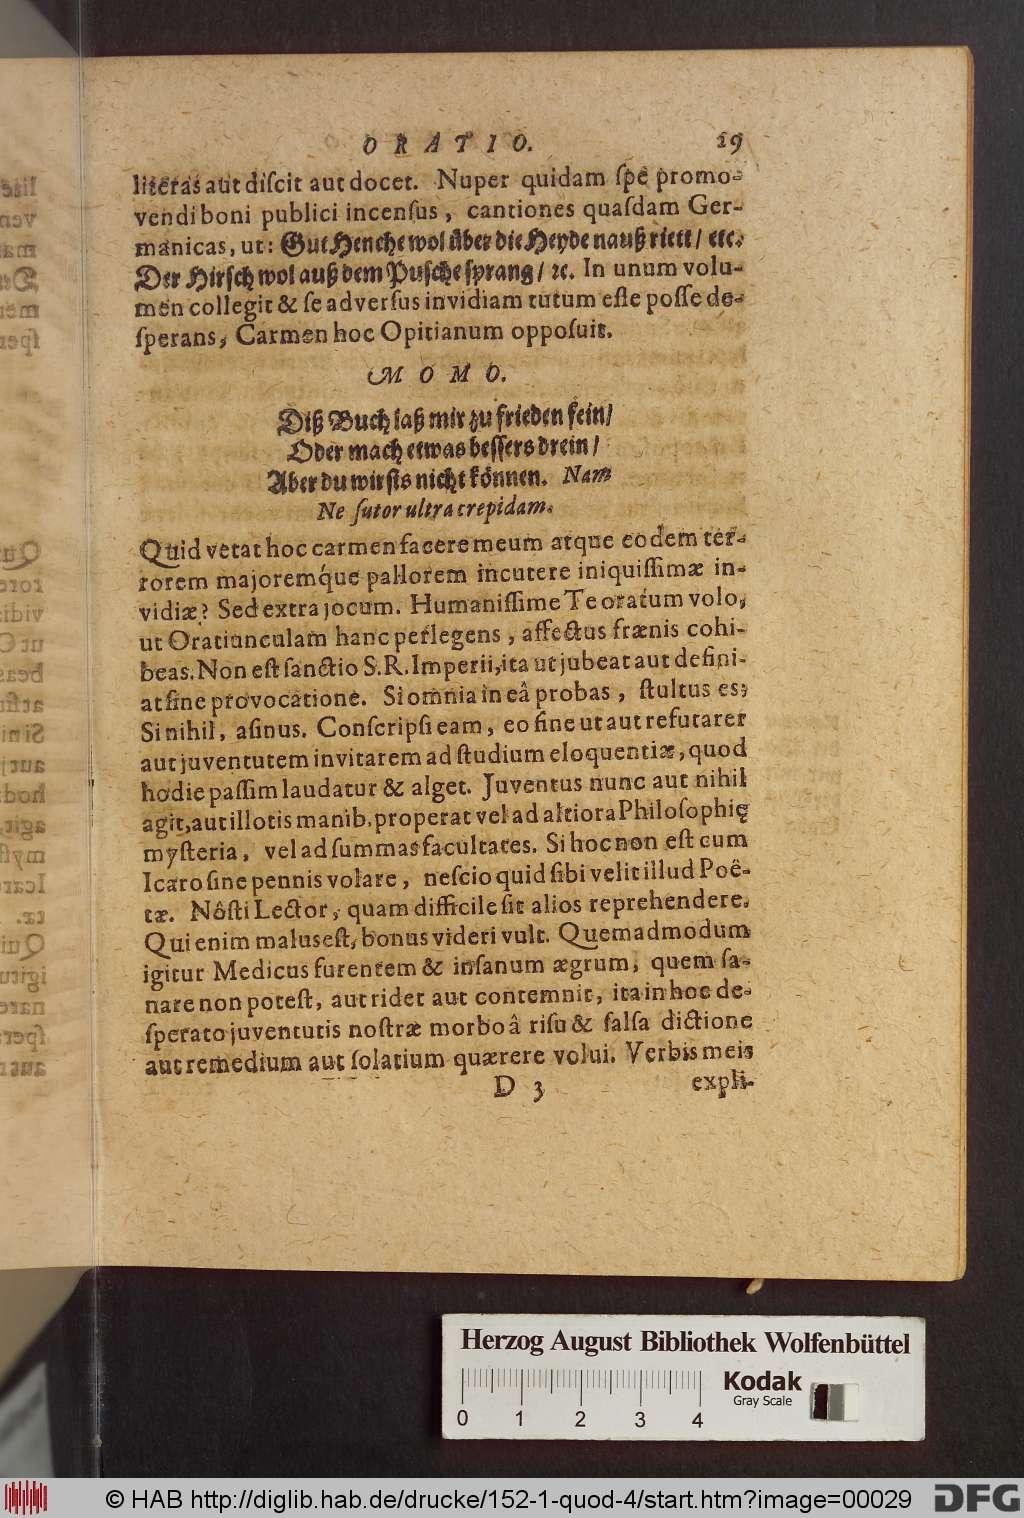 http://diglib.hab.de/drucke/152-1-quod-4/00029.jpg